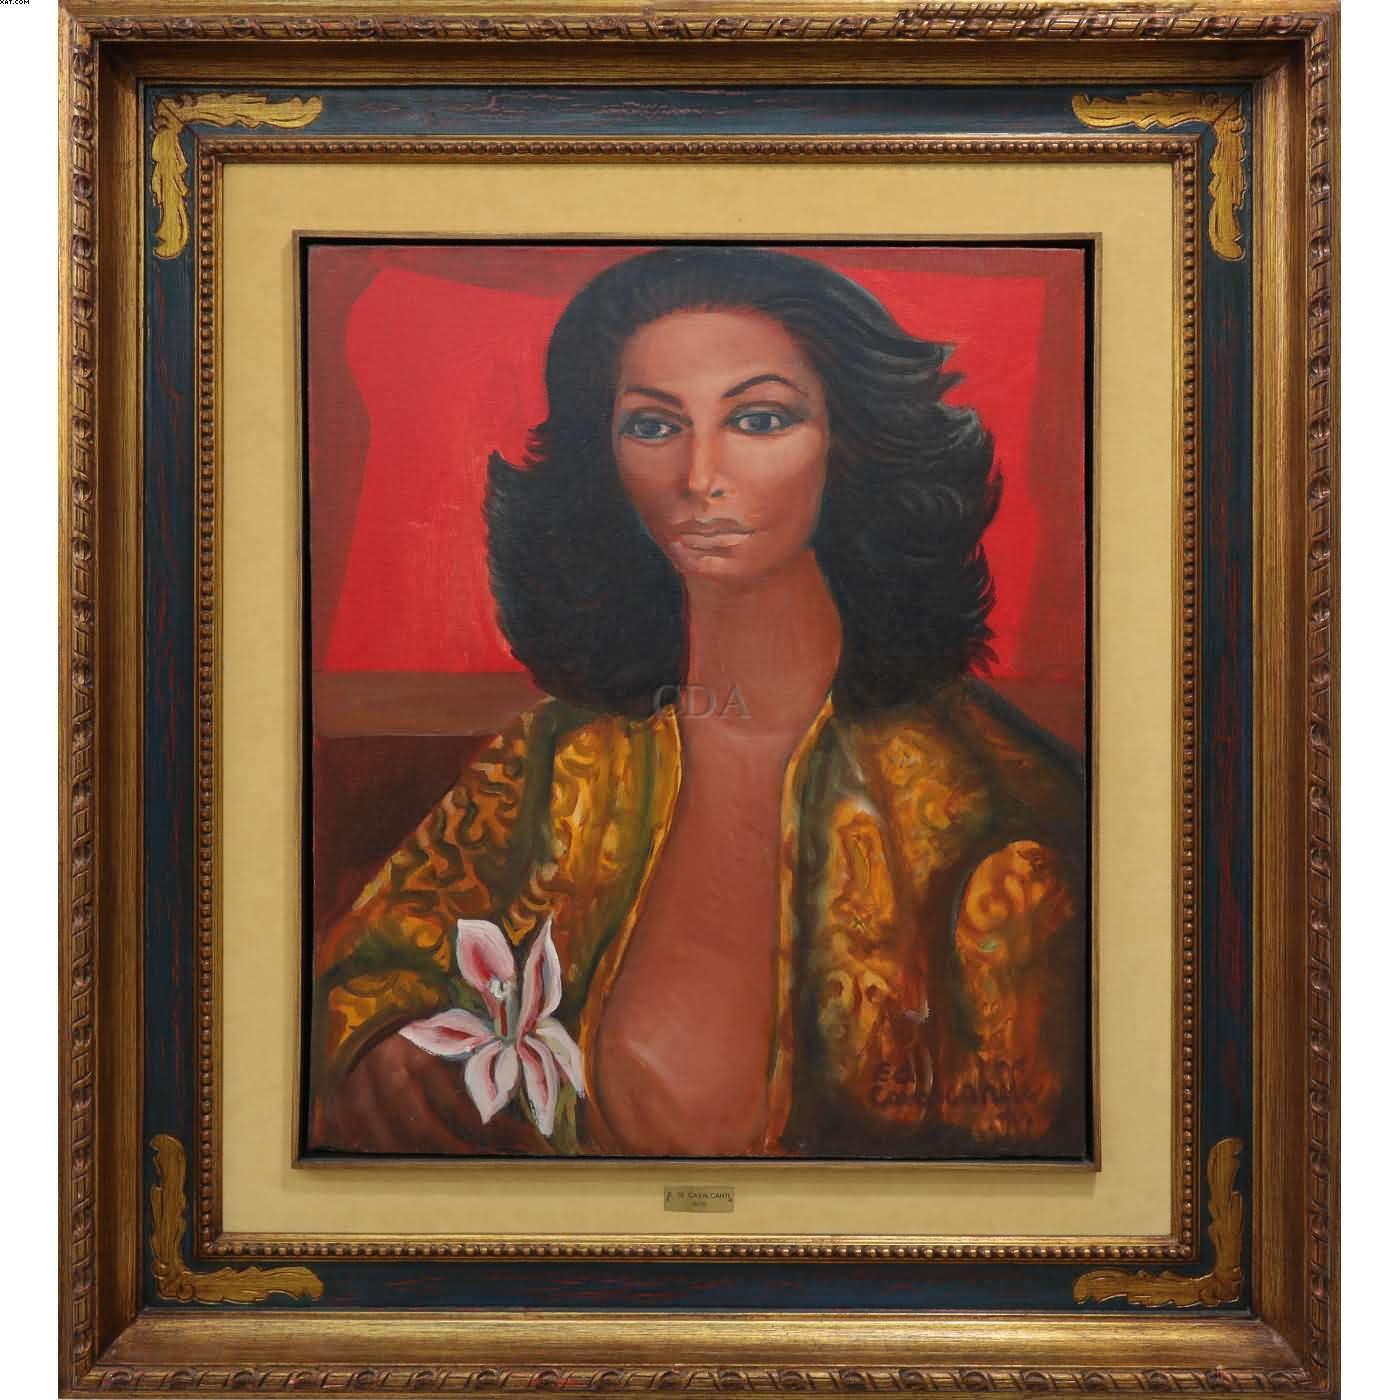 Figura feminina - Di Cavalcanti (1897-1976)